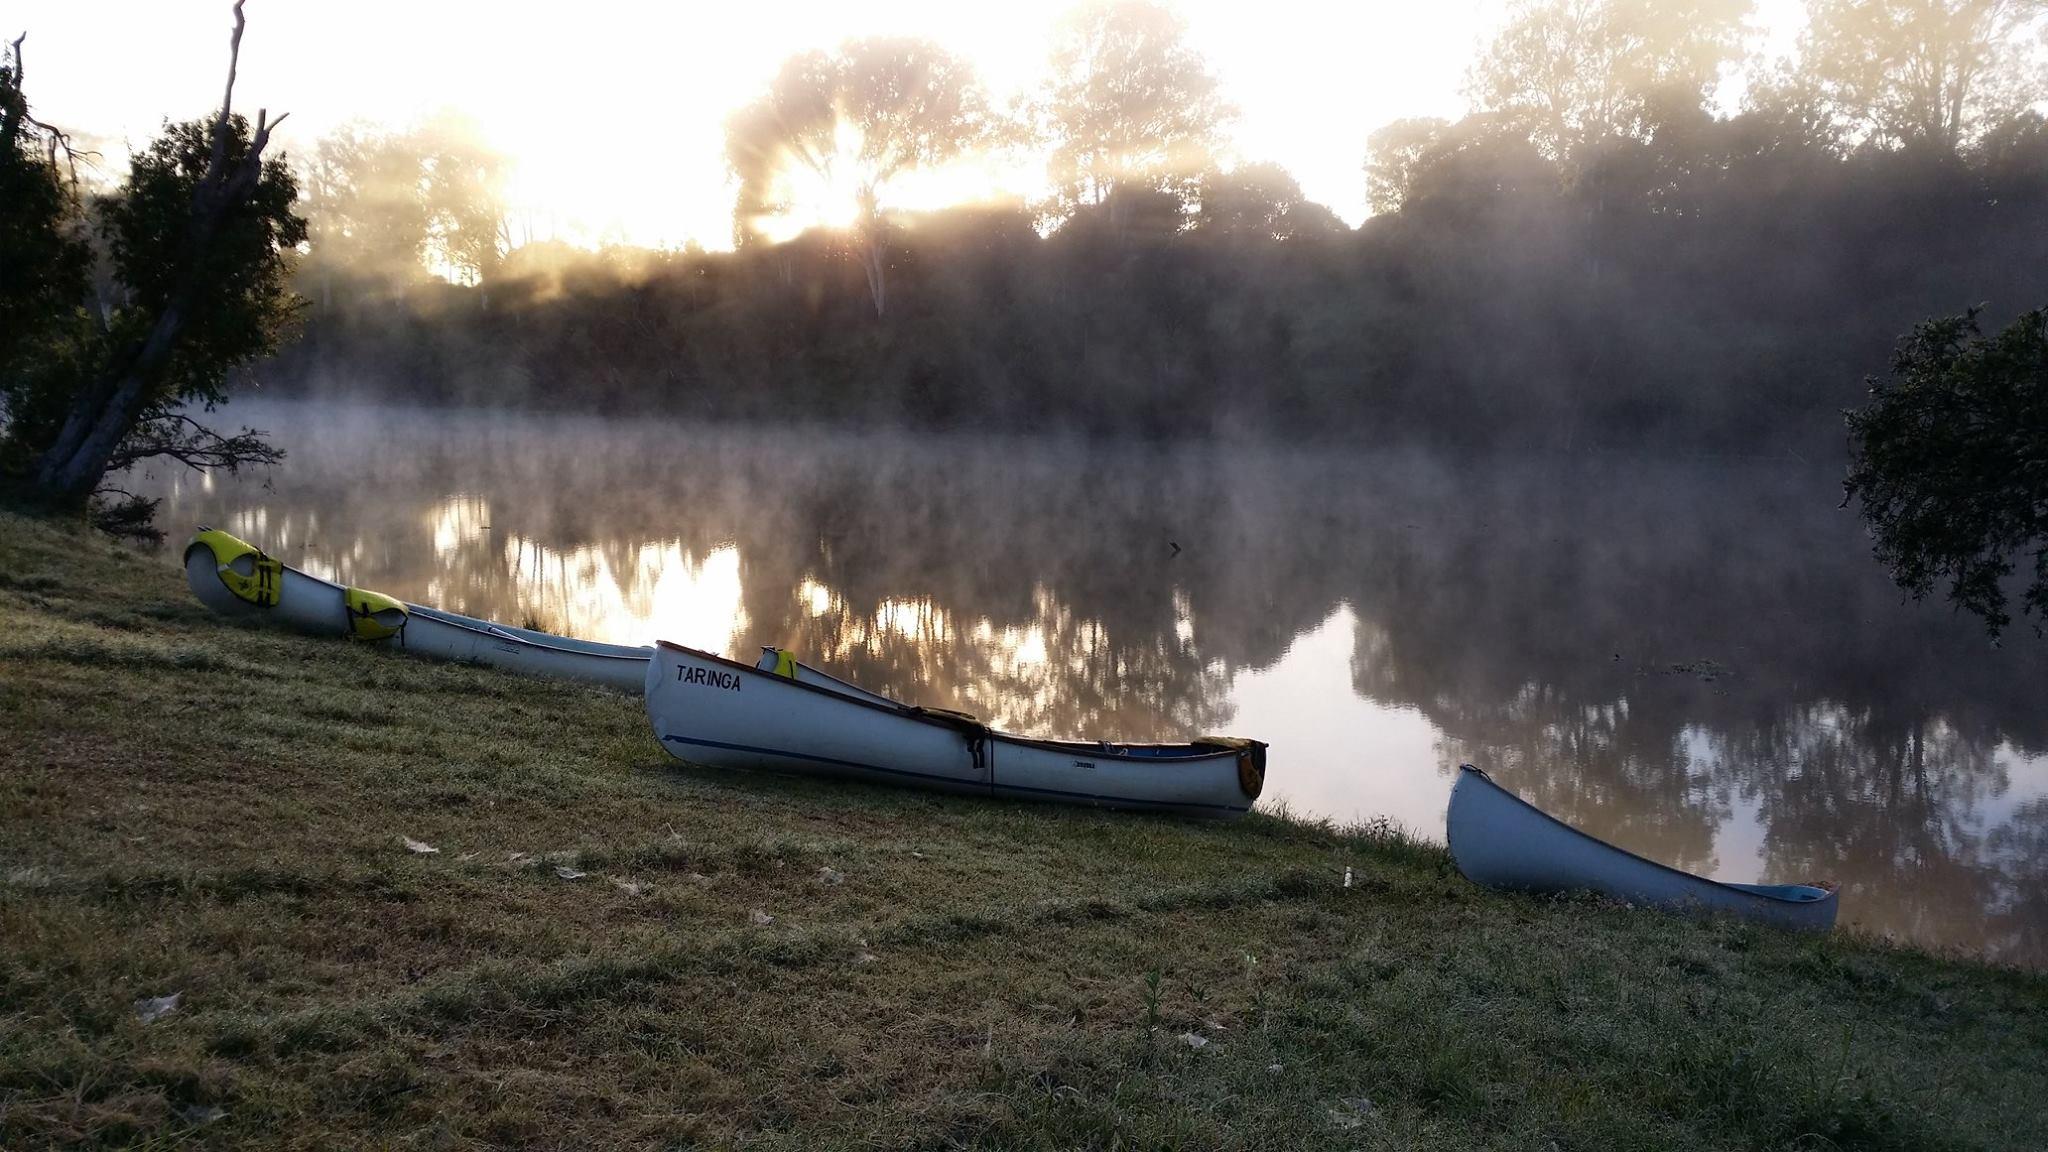 Fernvale Australia  City pictures : ... mist on Brisbane River near Fernvale – Taringa Milton Toowong Scouts